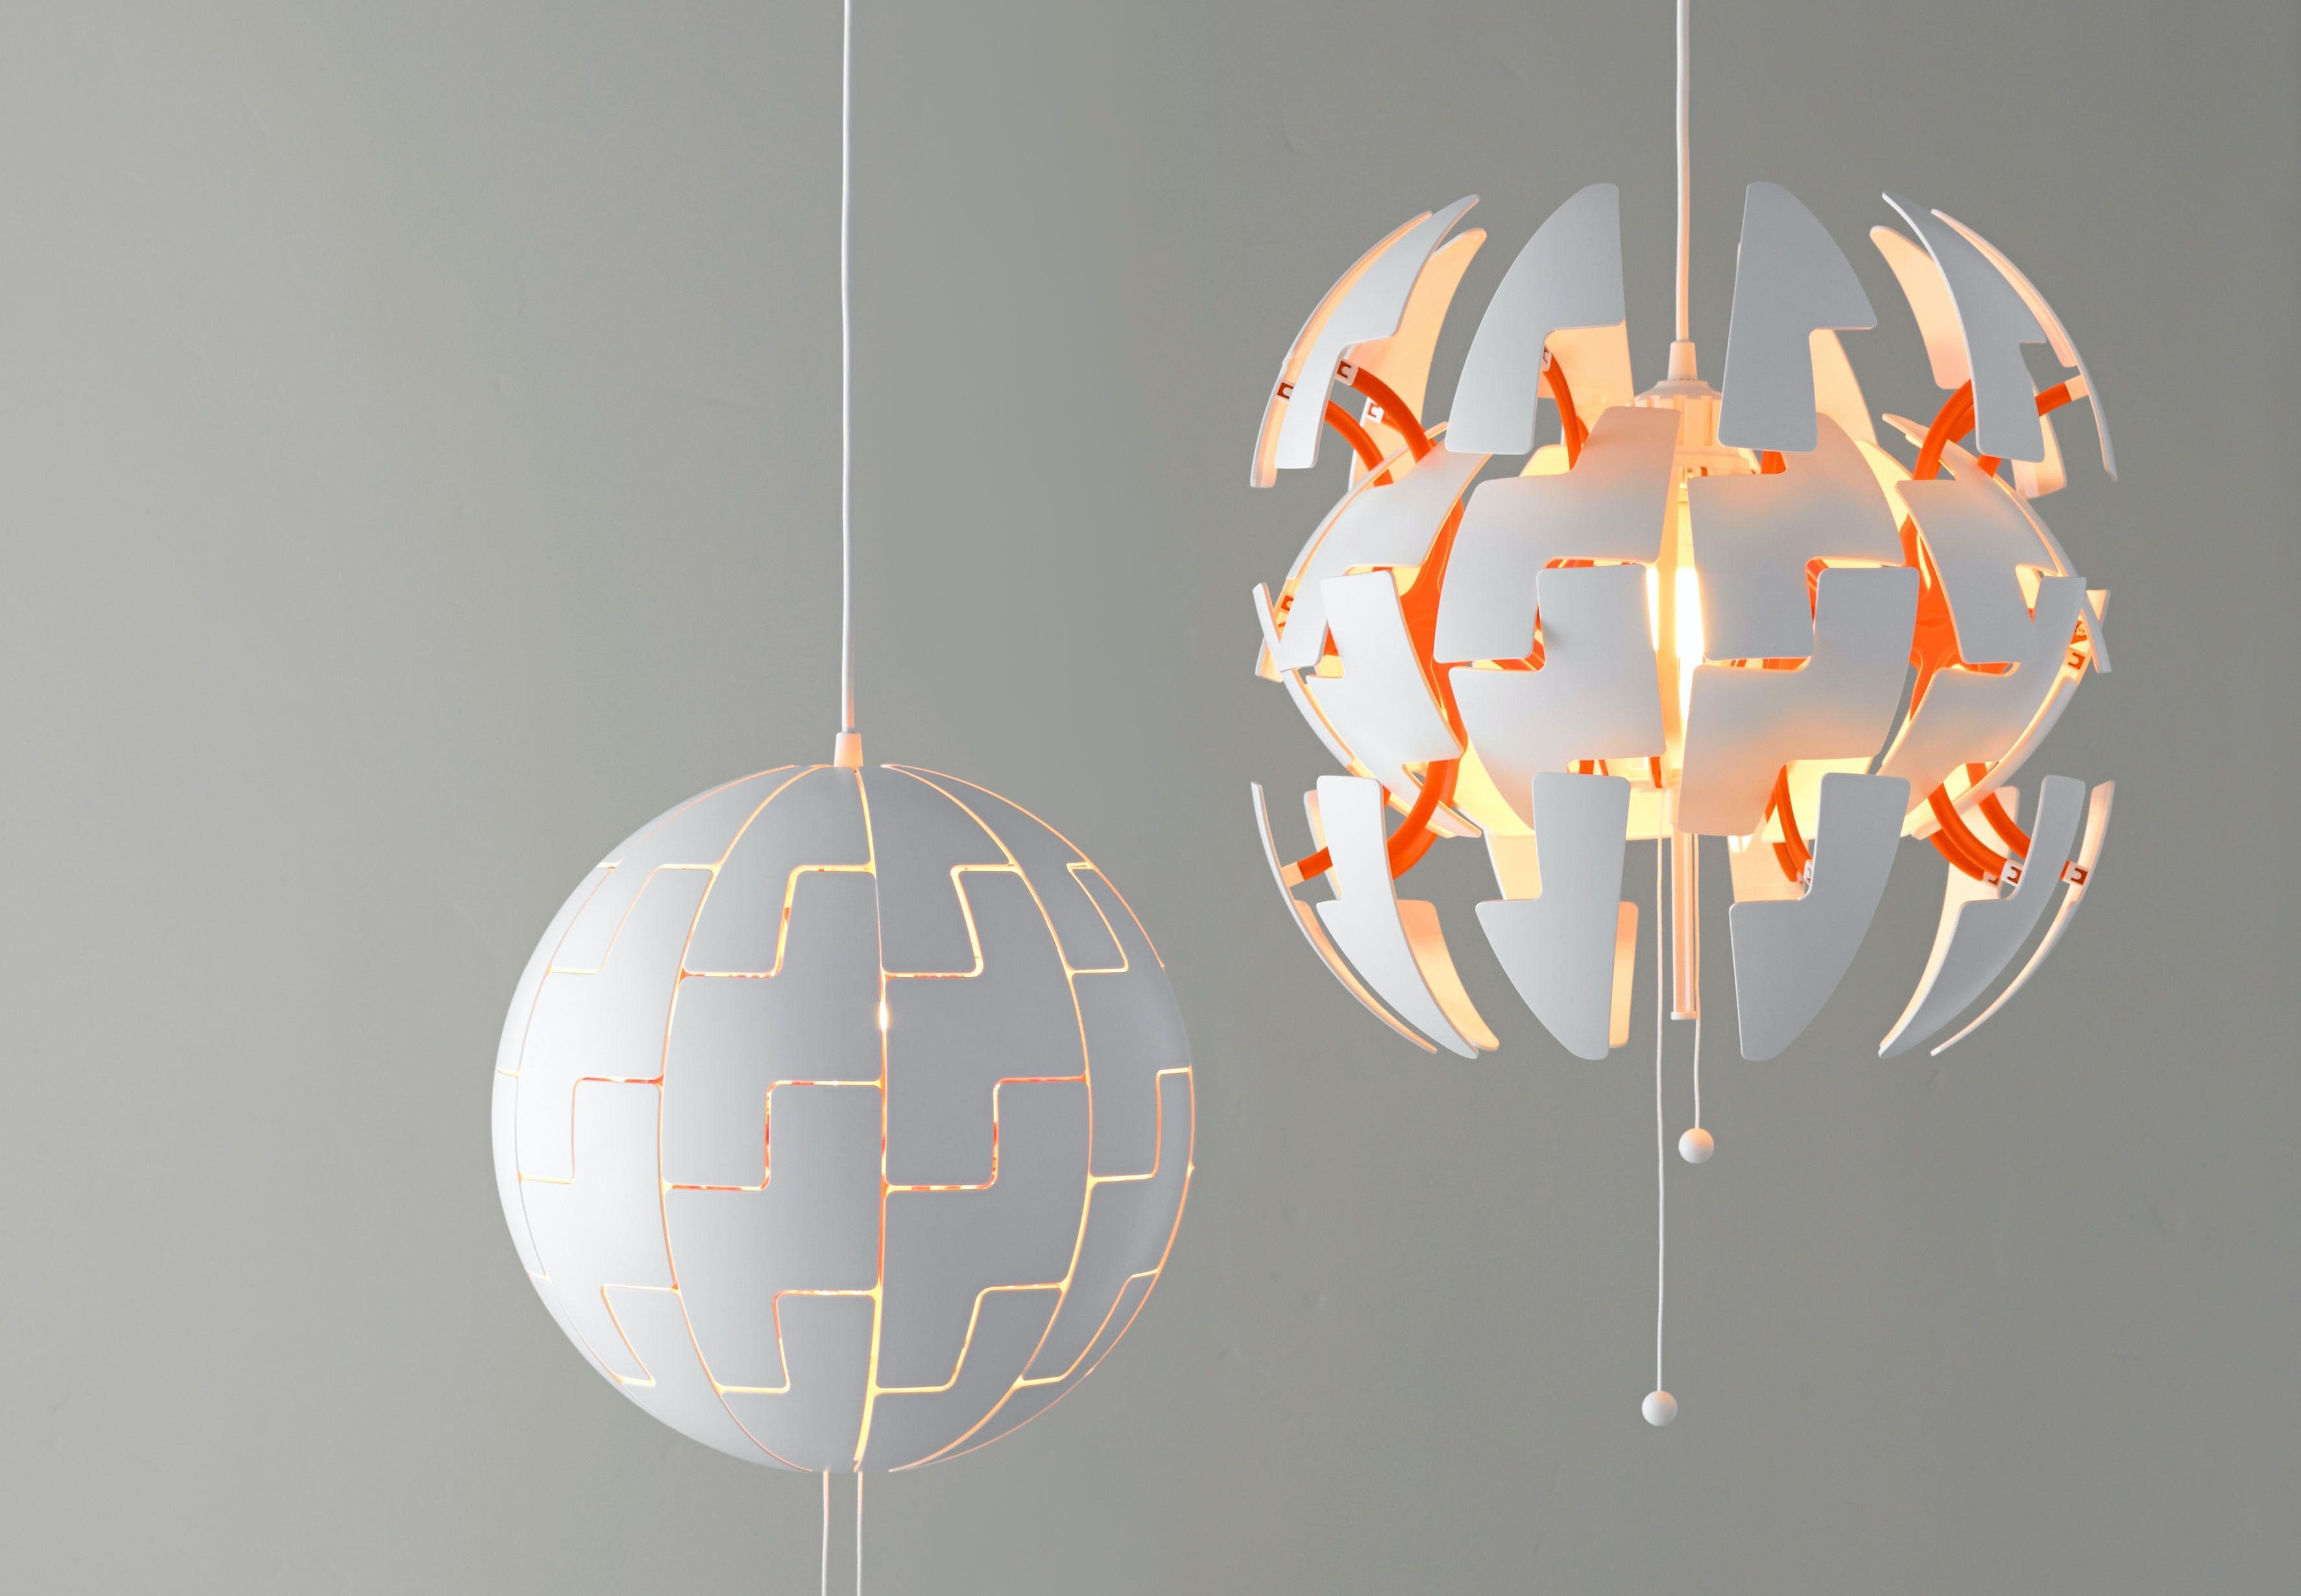 ikea f r fin pris for science fiction lampe. Black Bedroom Furniture Sets. Home Design Ideas